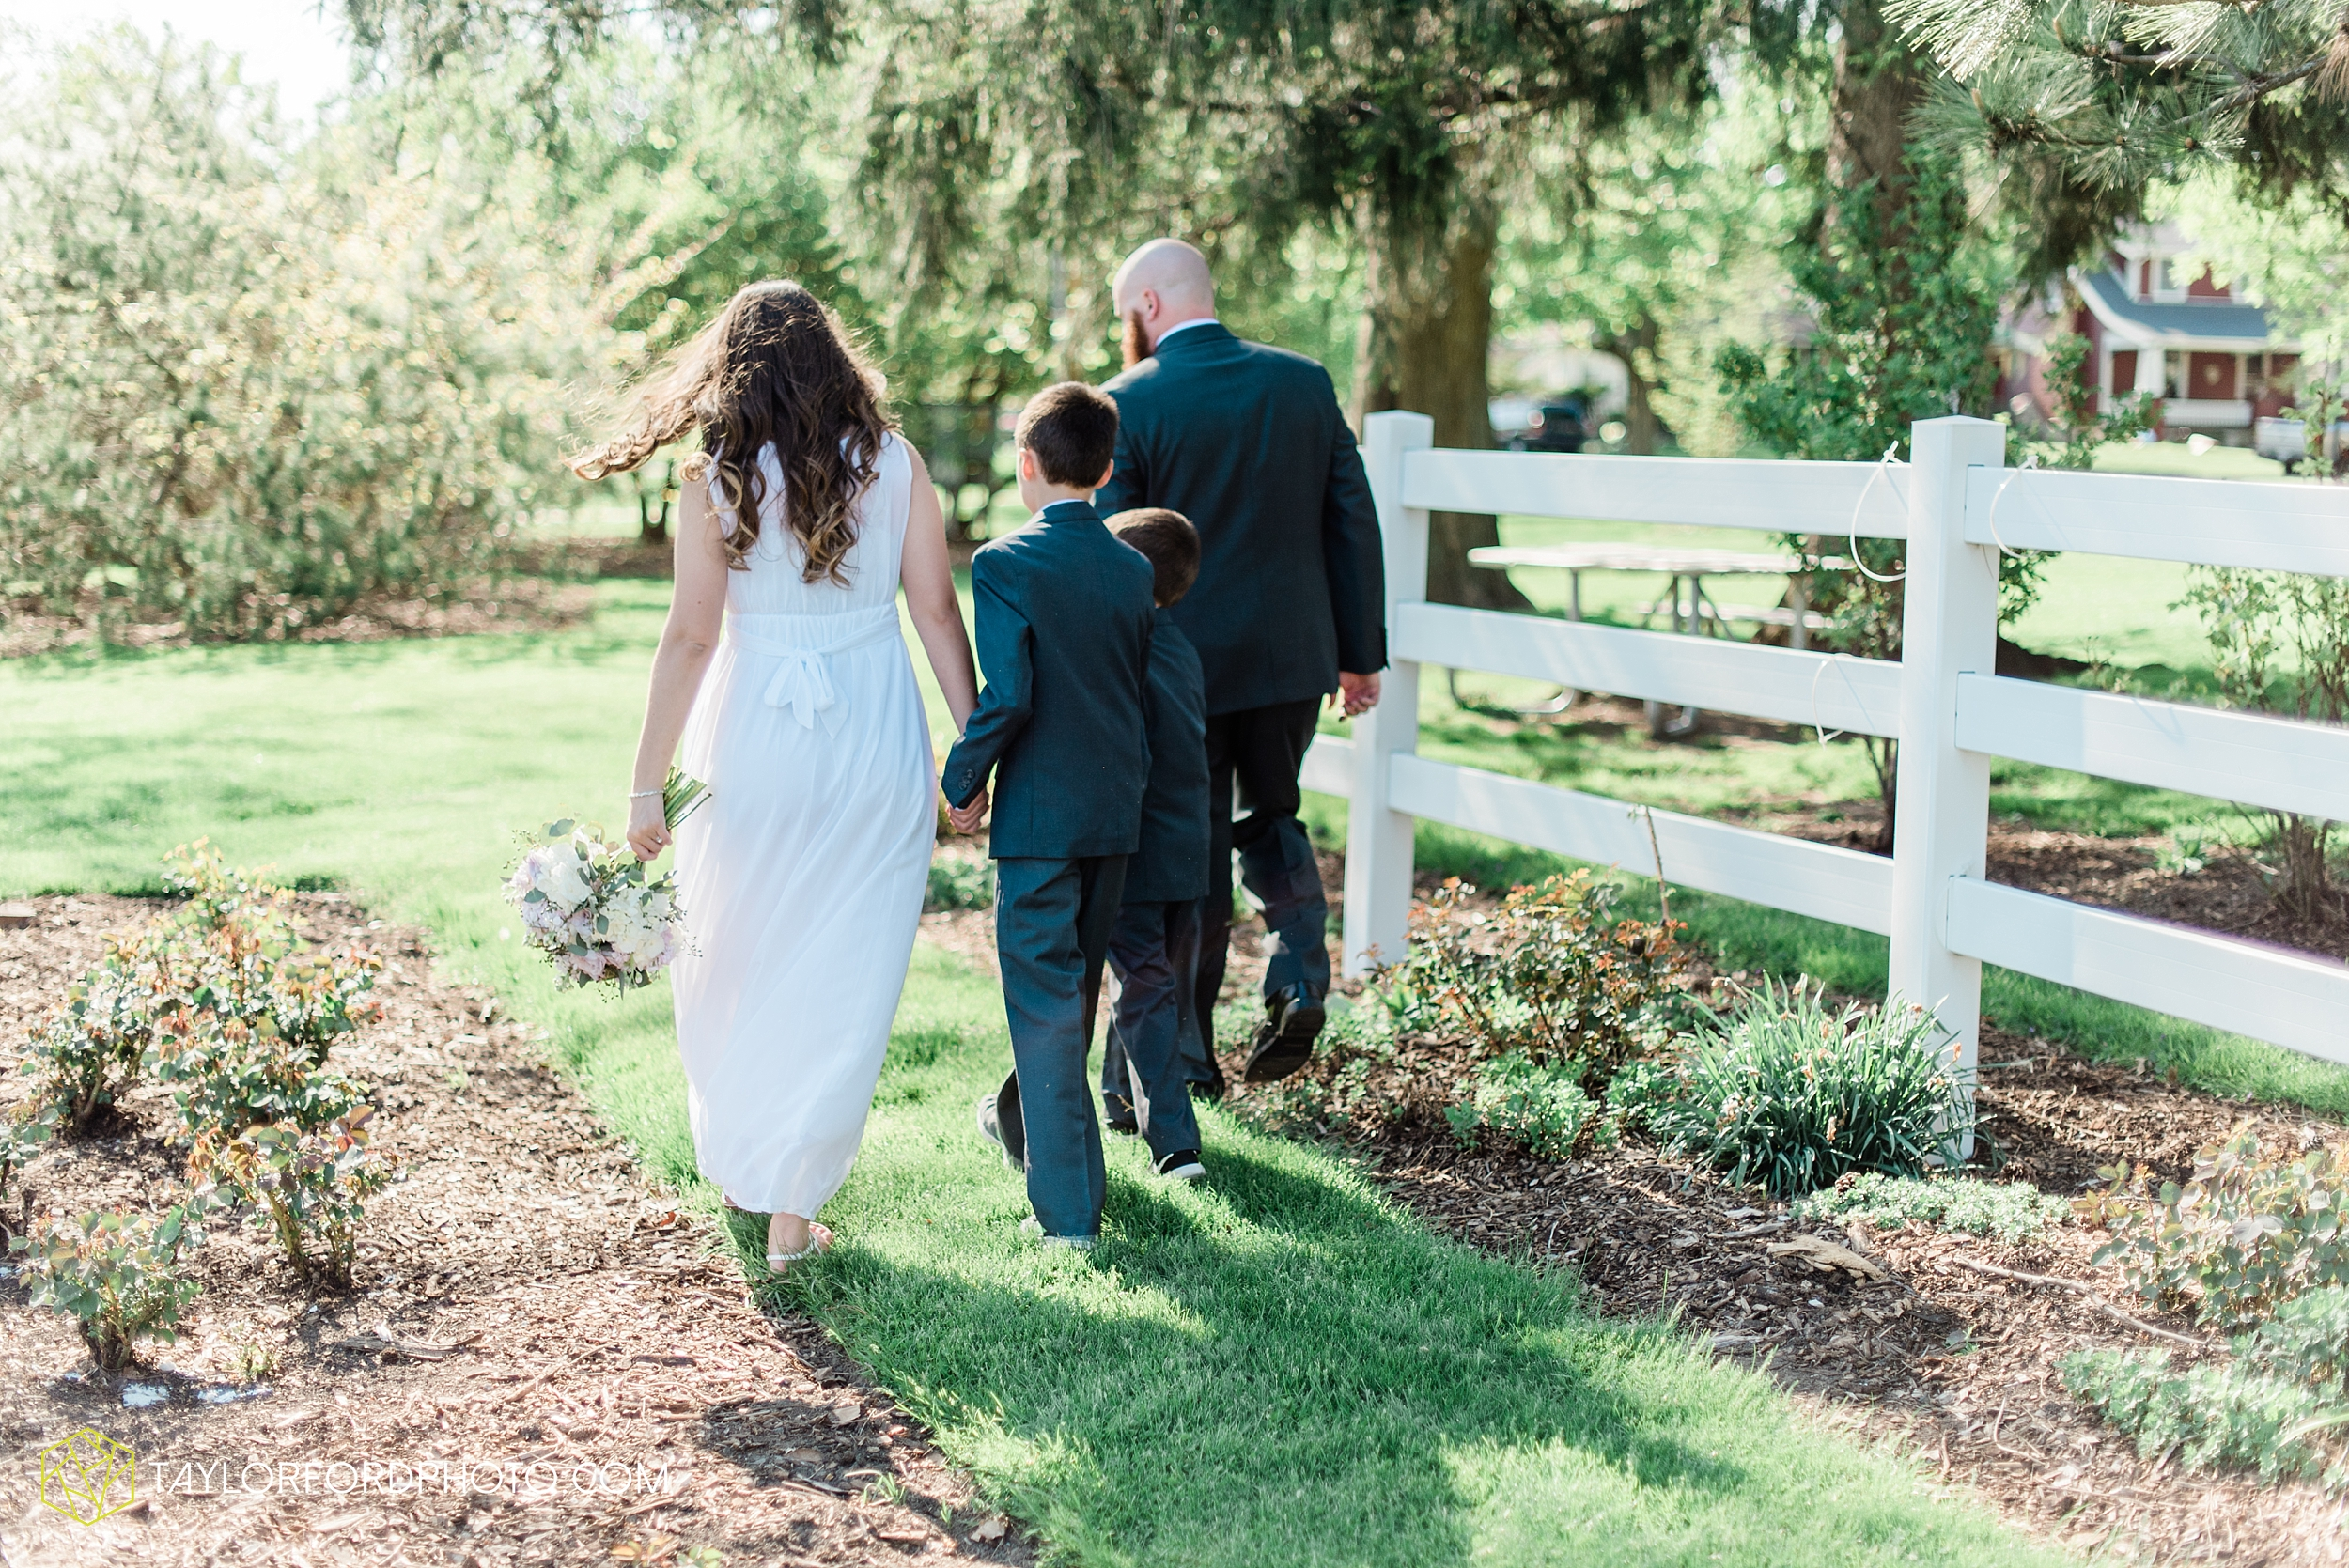 lakeside-rose-gardens-fort-wayne-indiana-elopement-wedding-photographer-Taylor-Ford-Photography_7176.jpg